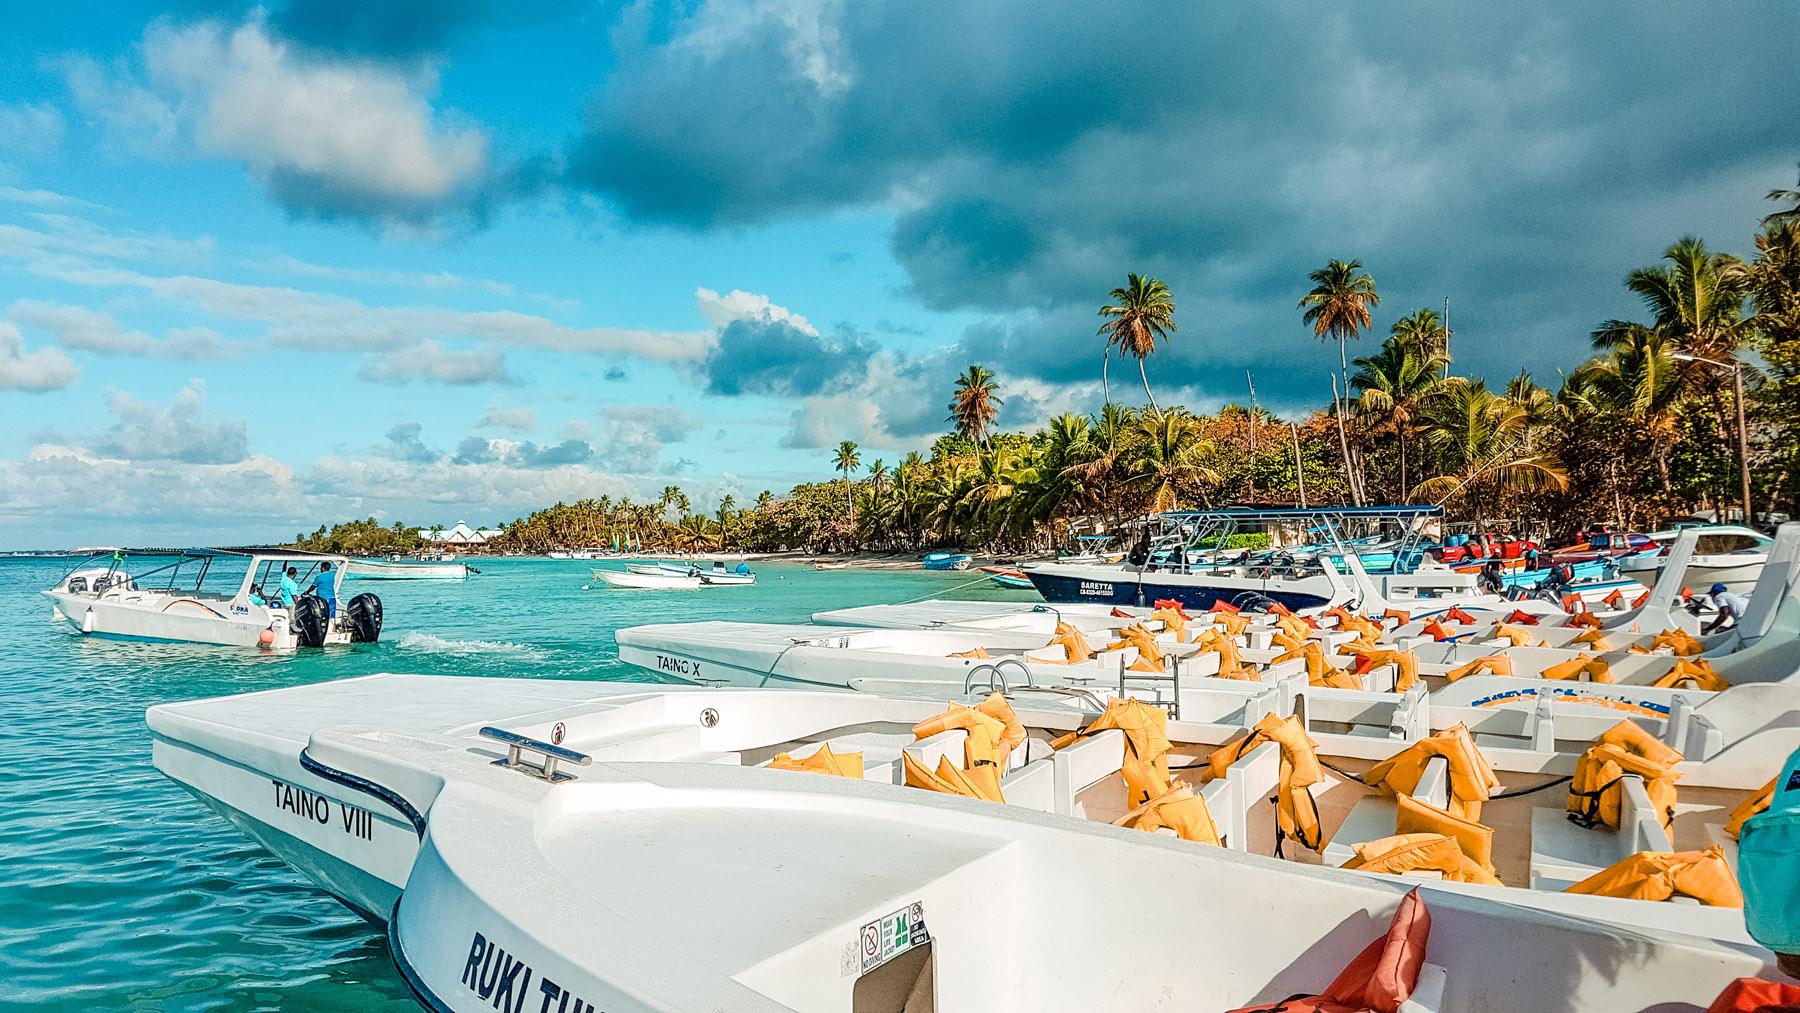 Dominikanische Republik Ausflug Boot